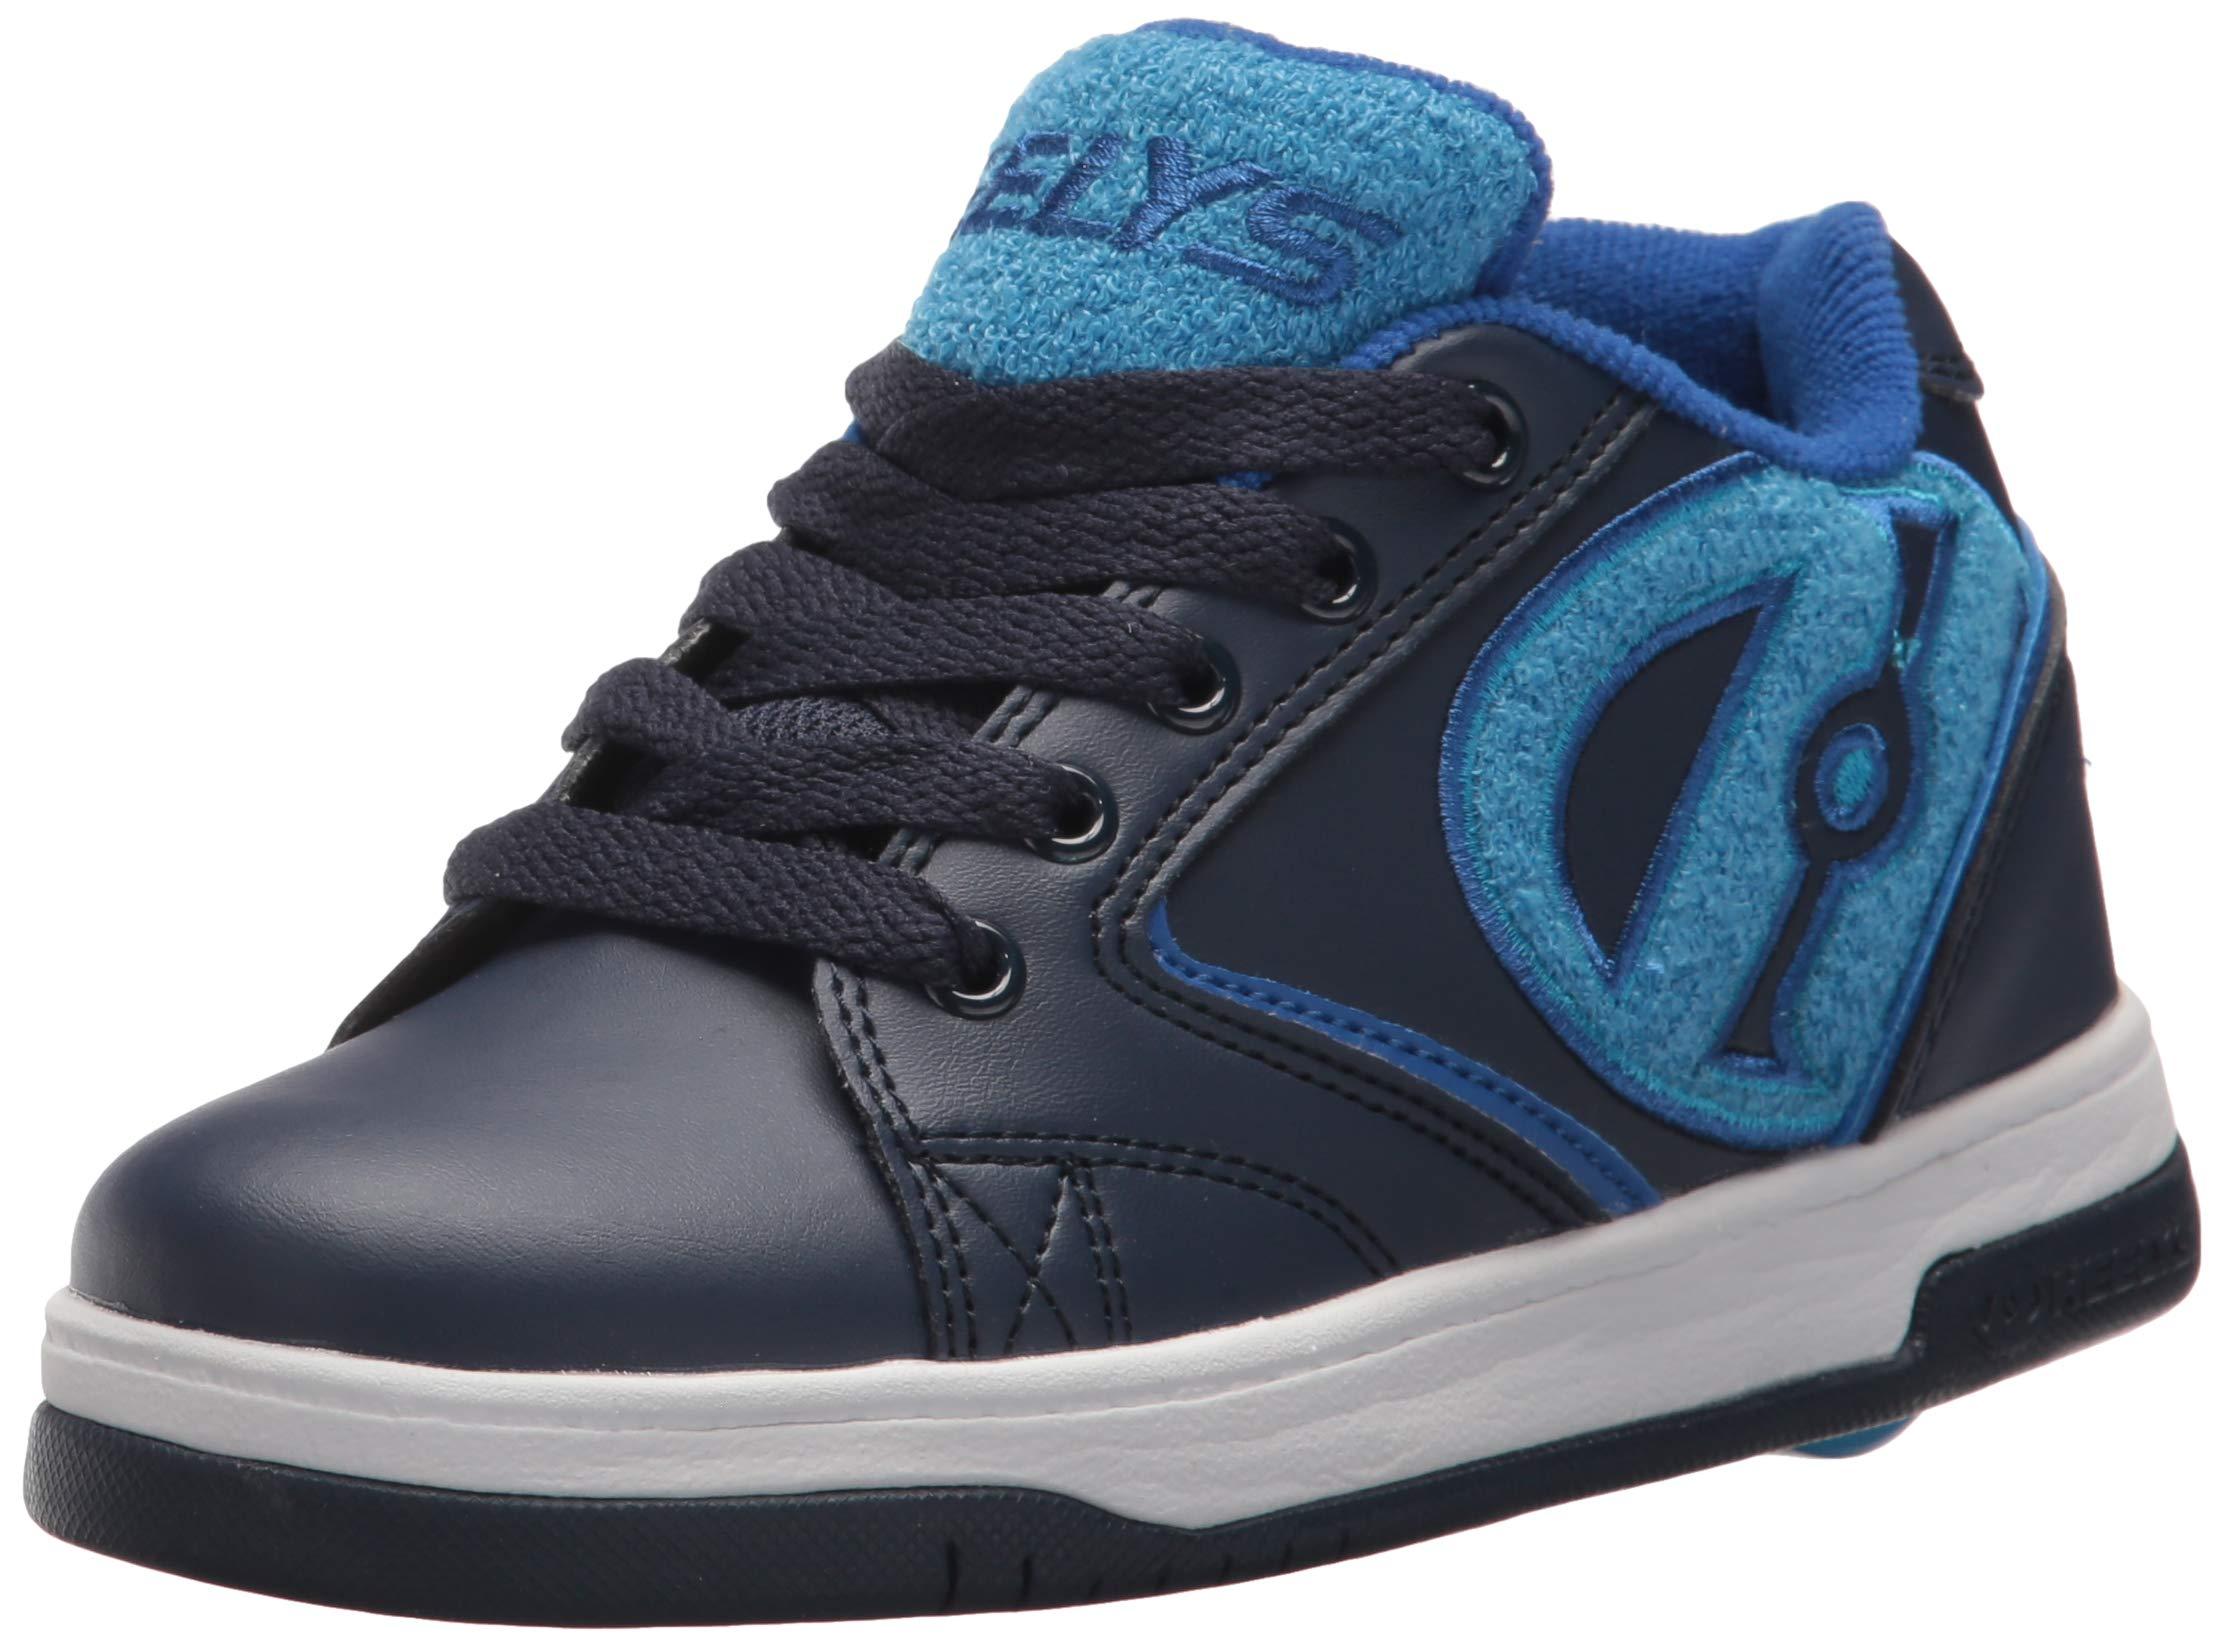 Heelys Boys' Propel Terry Tennis Shoe, Navy/Blue, 6 M US Big Kid